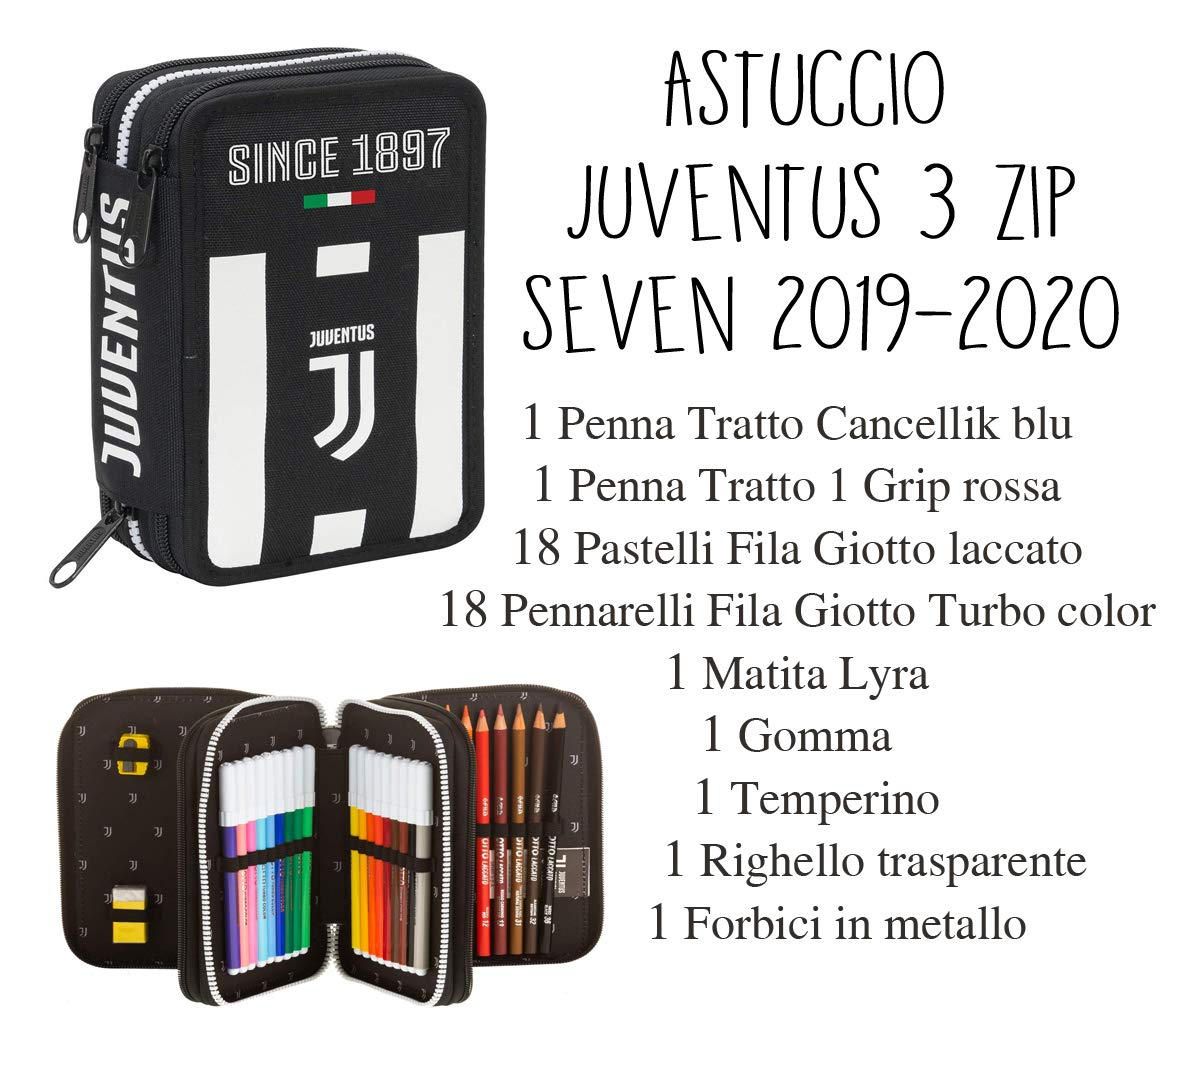 Estuche Juventus 3 Zip 2019-2020 oficial – Seven